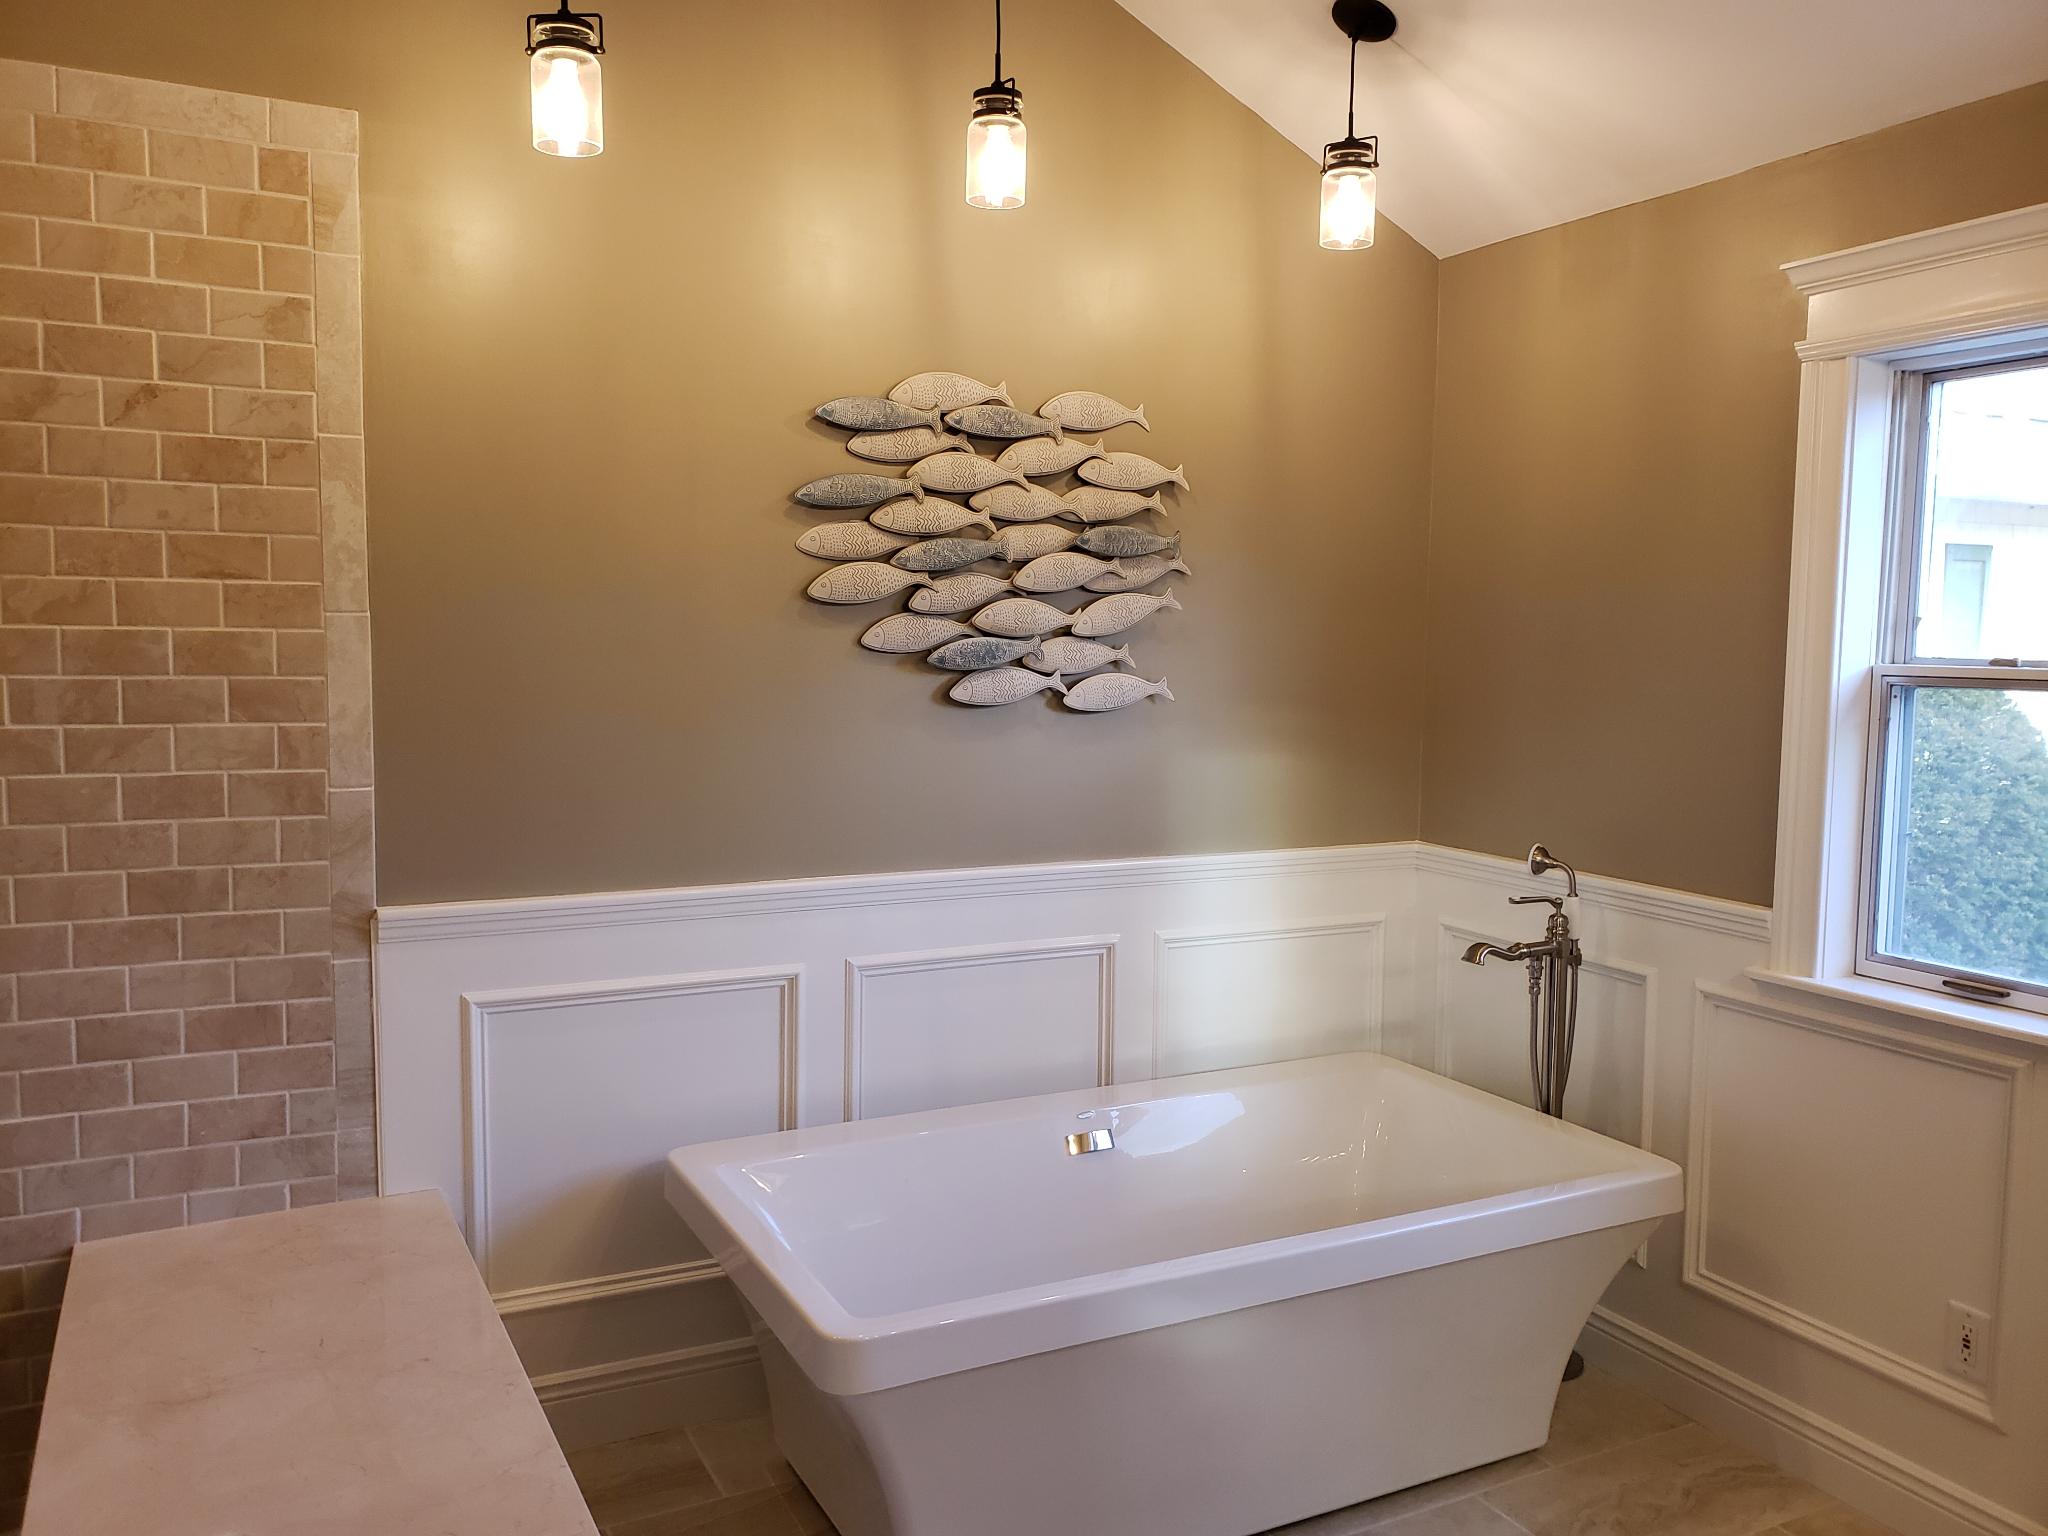 master bath in progress-6fbd962e-7a2a-4e39-a163-7cb3288973ca.png